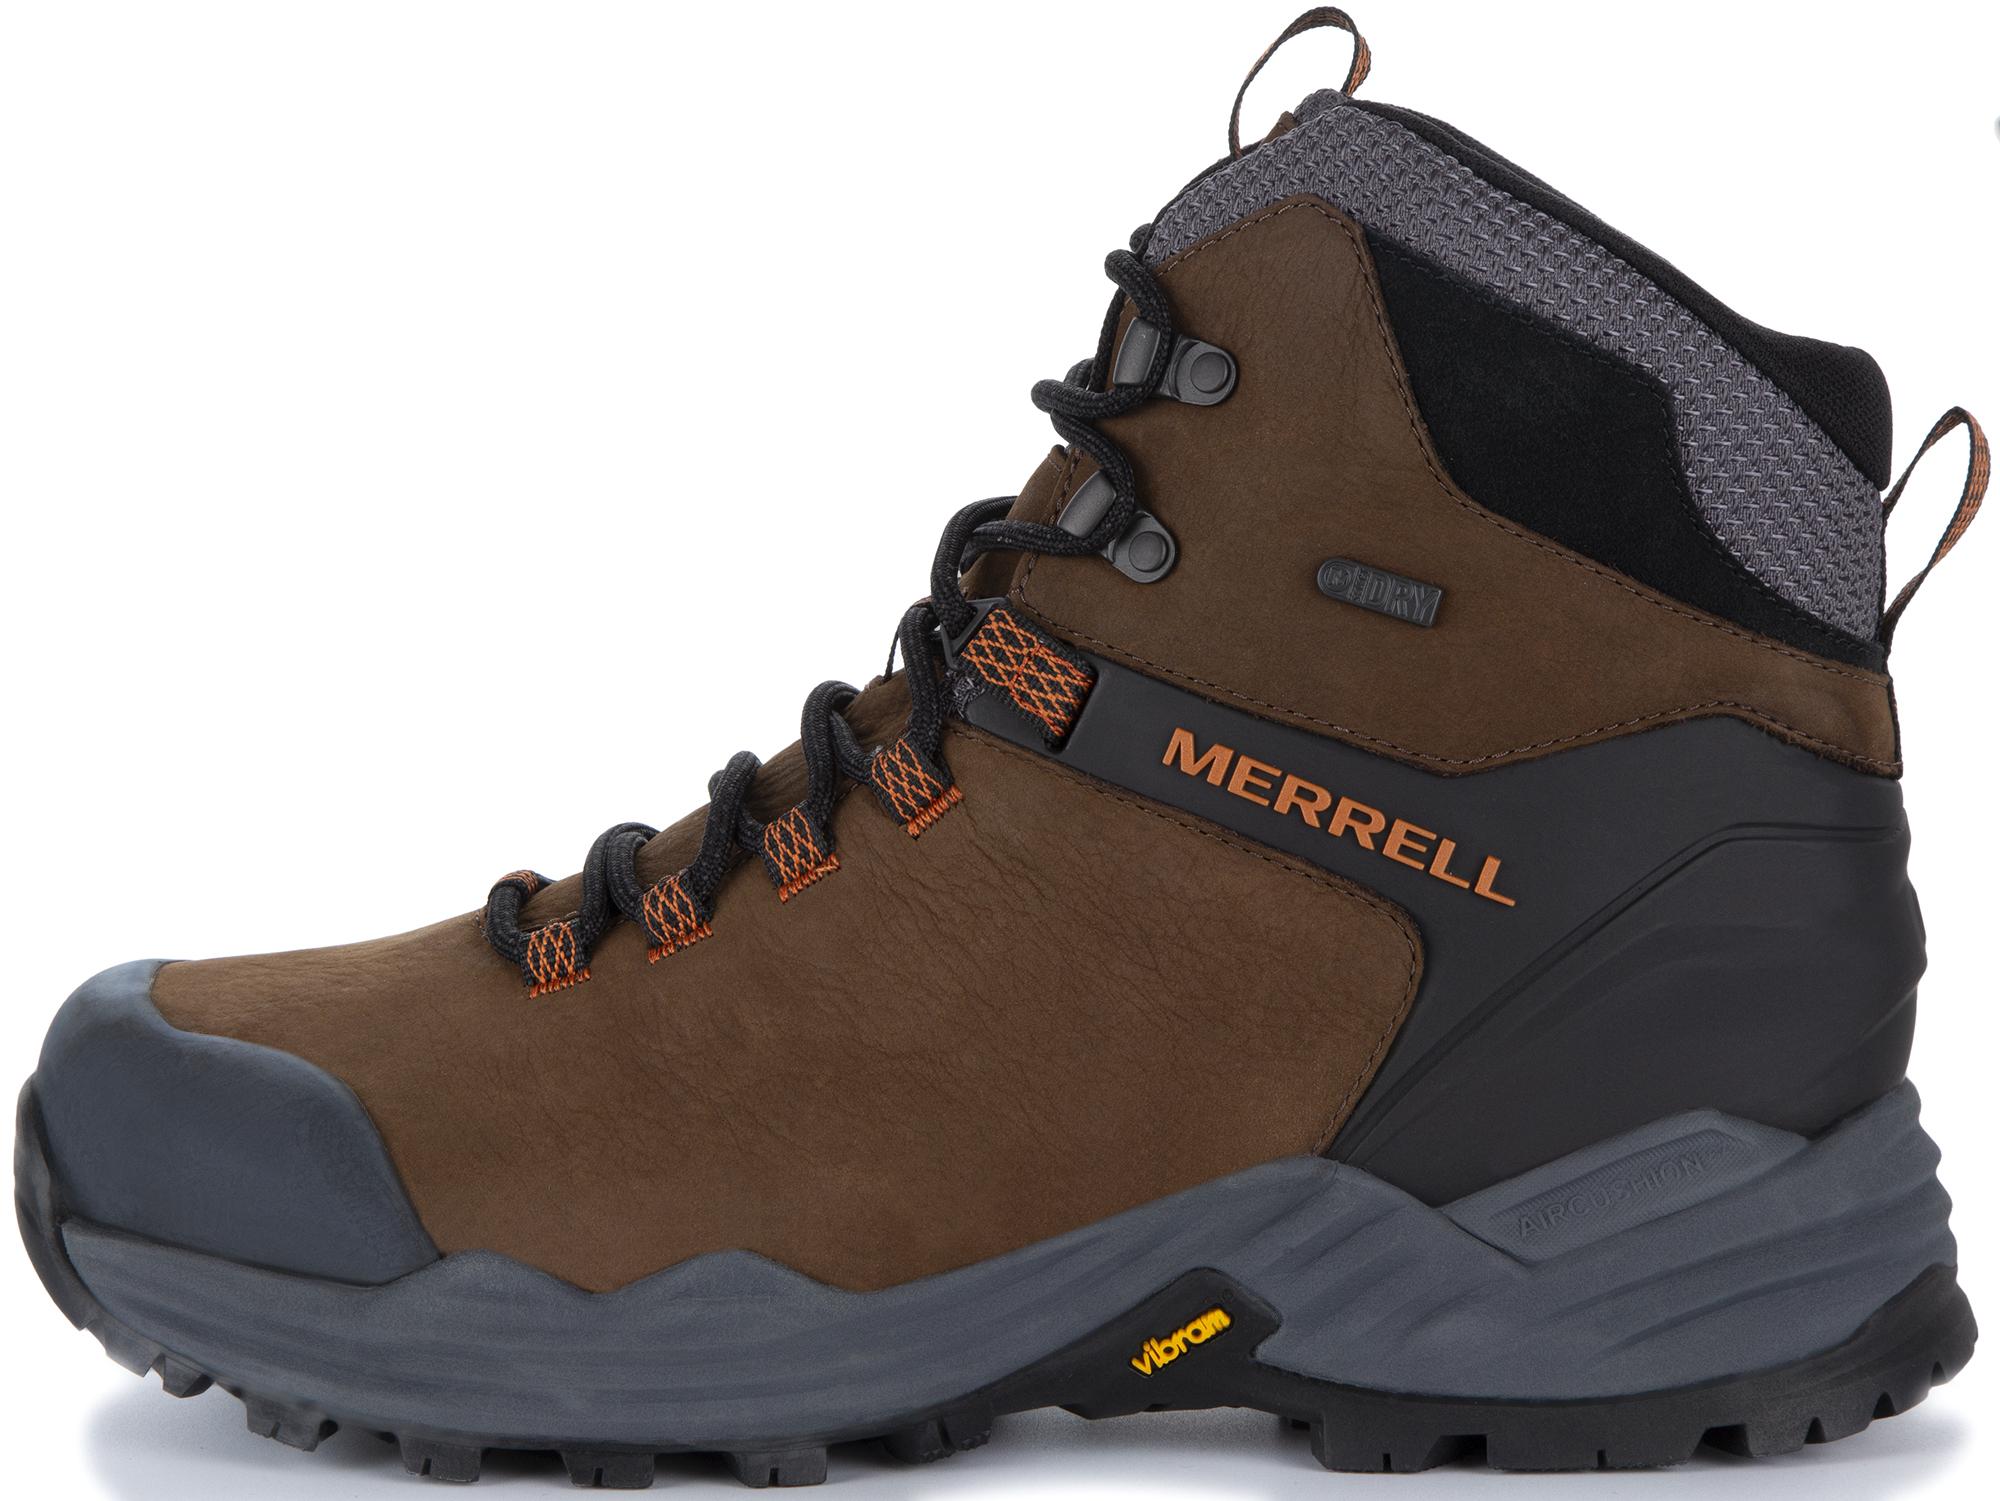 Merrell Ботинки мужские Phaserbound 2, размер 46